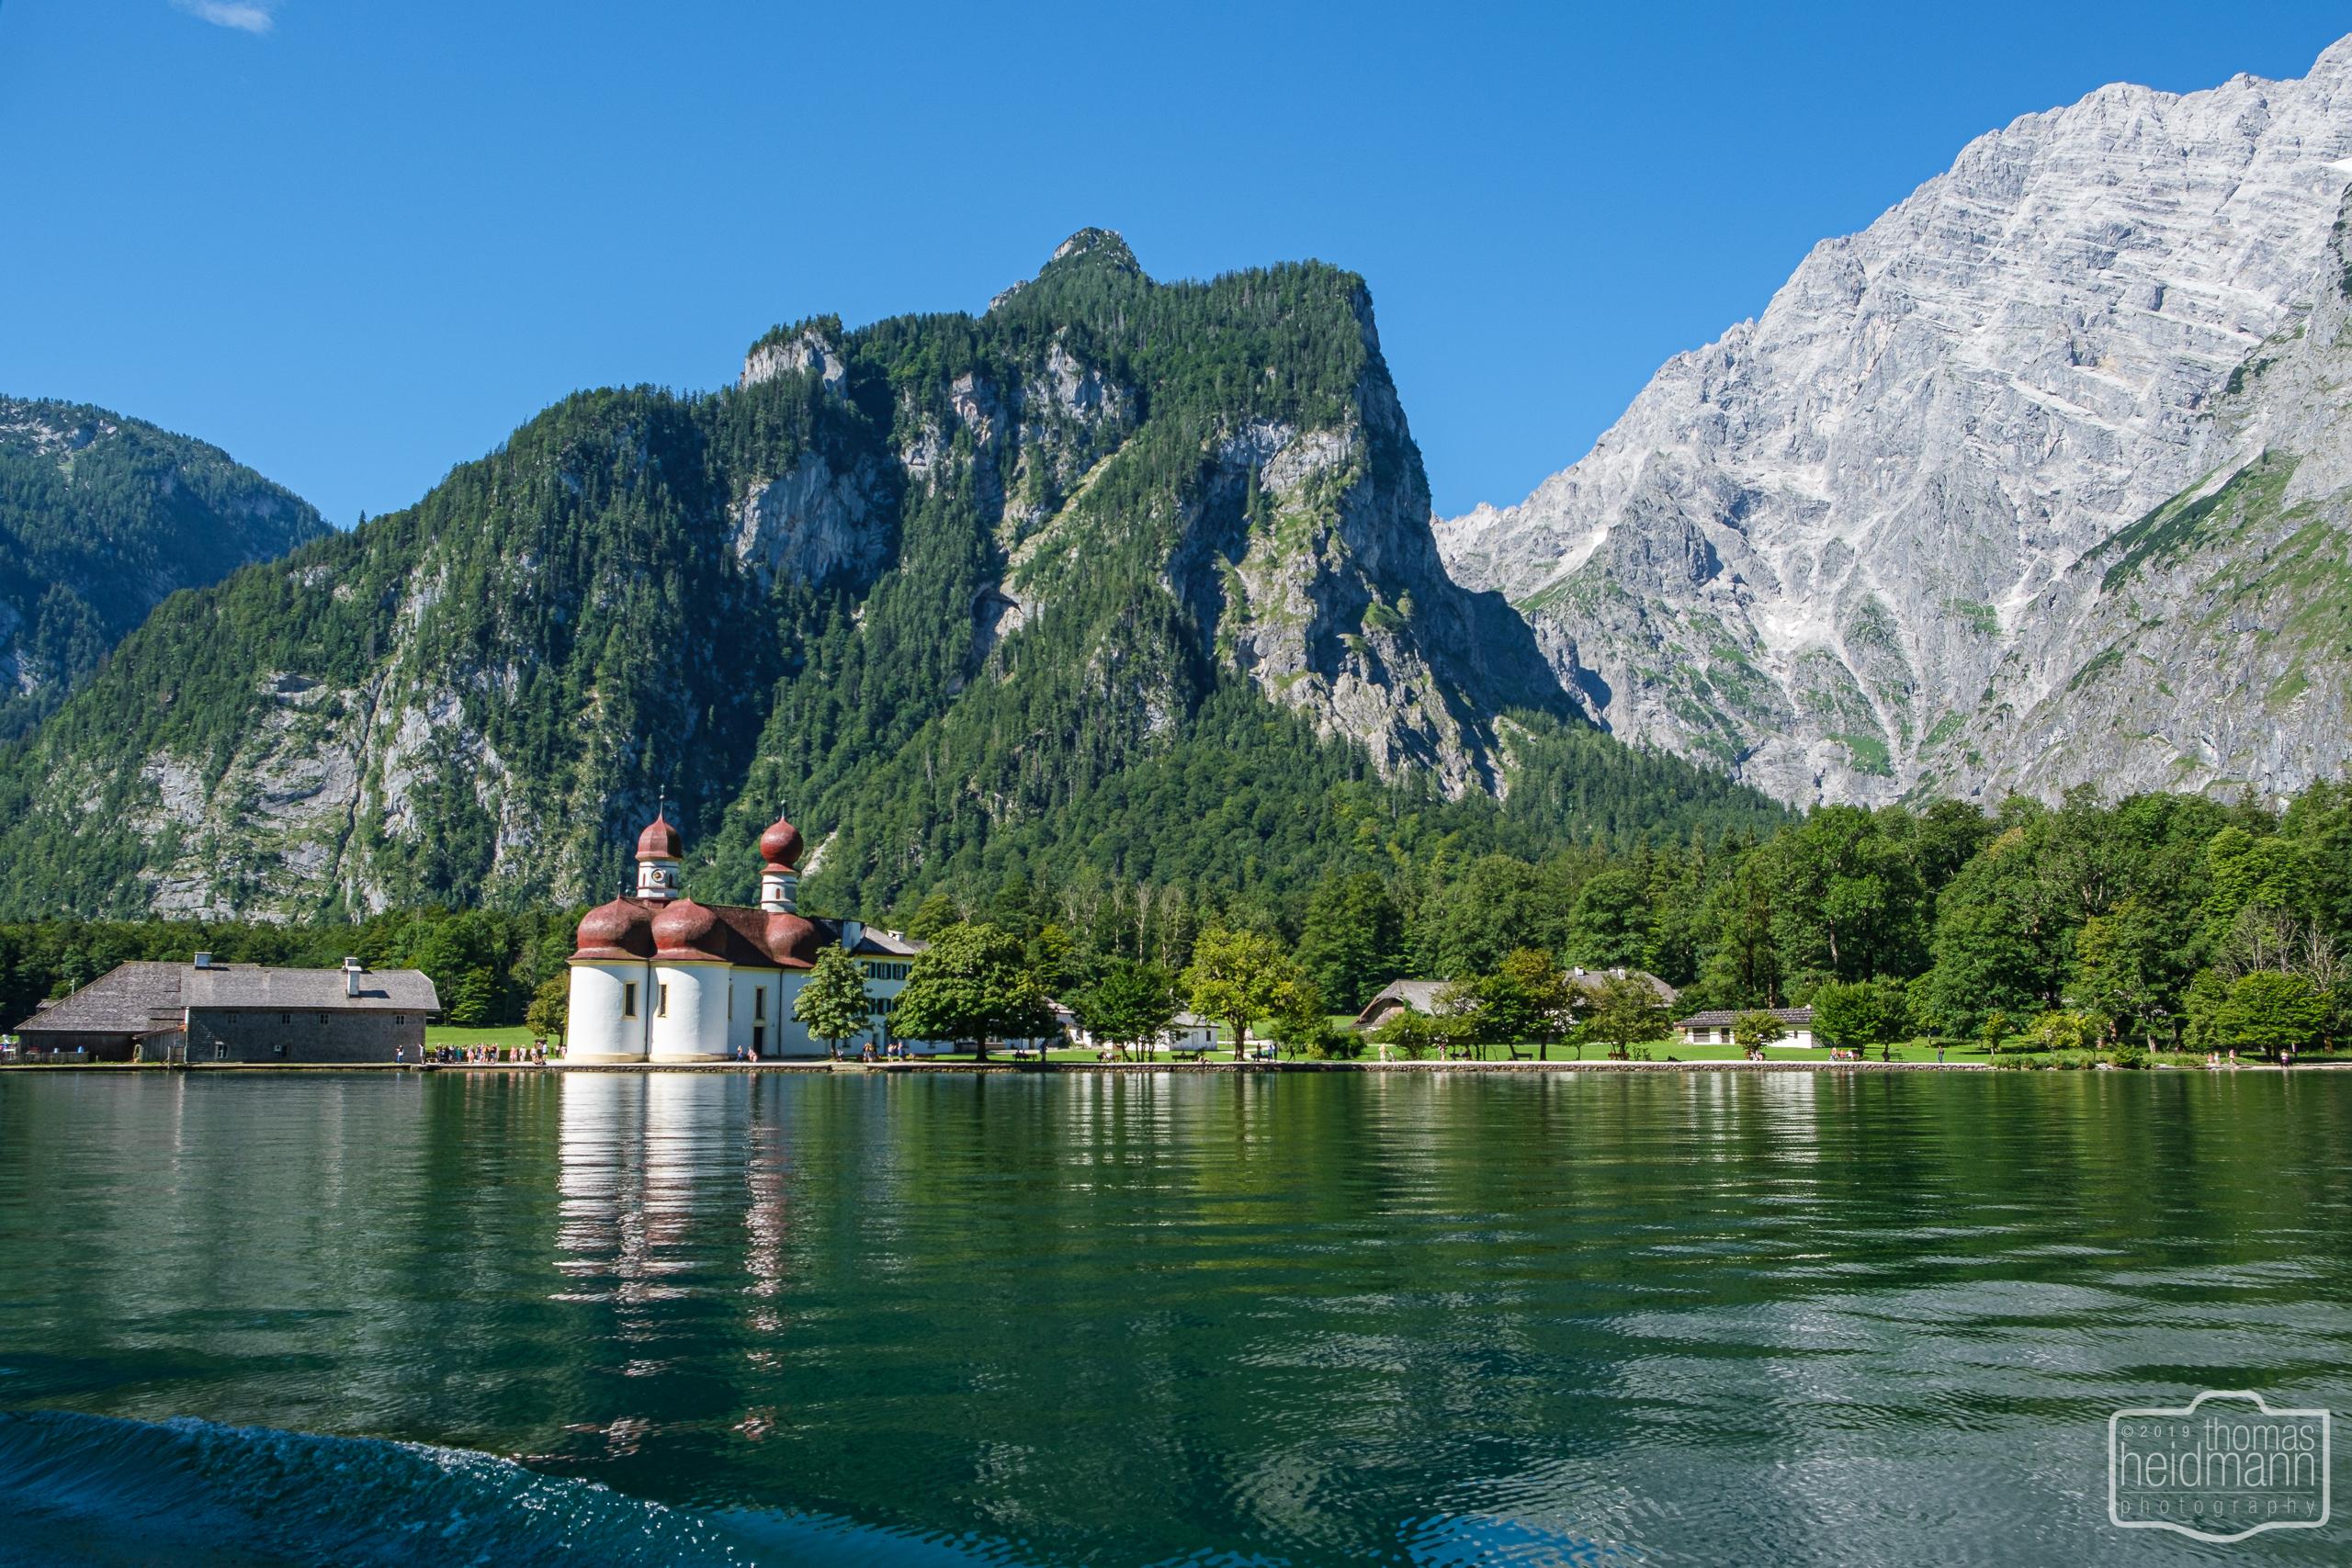 Bootsfahrt auf dem Königssee - Bartholomäuskirche